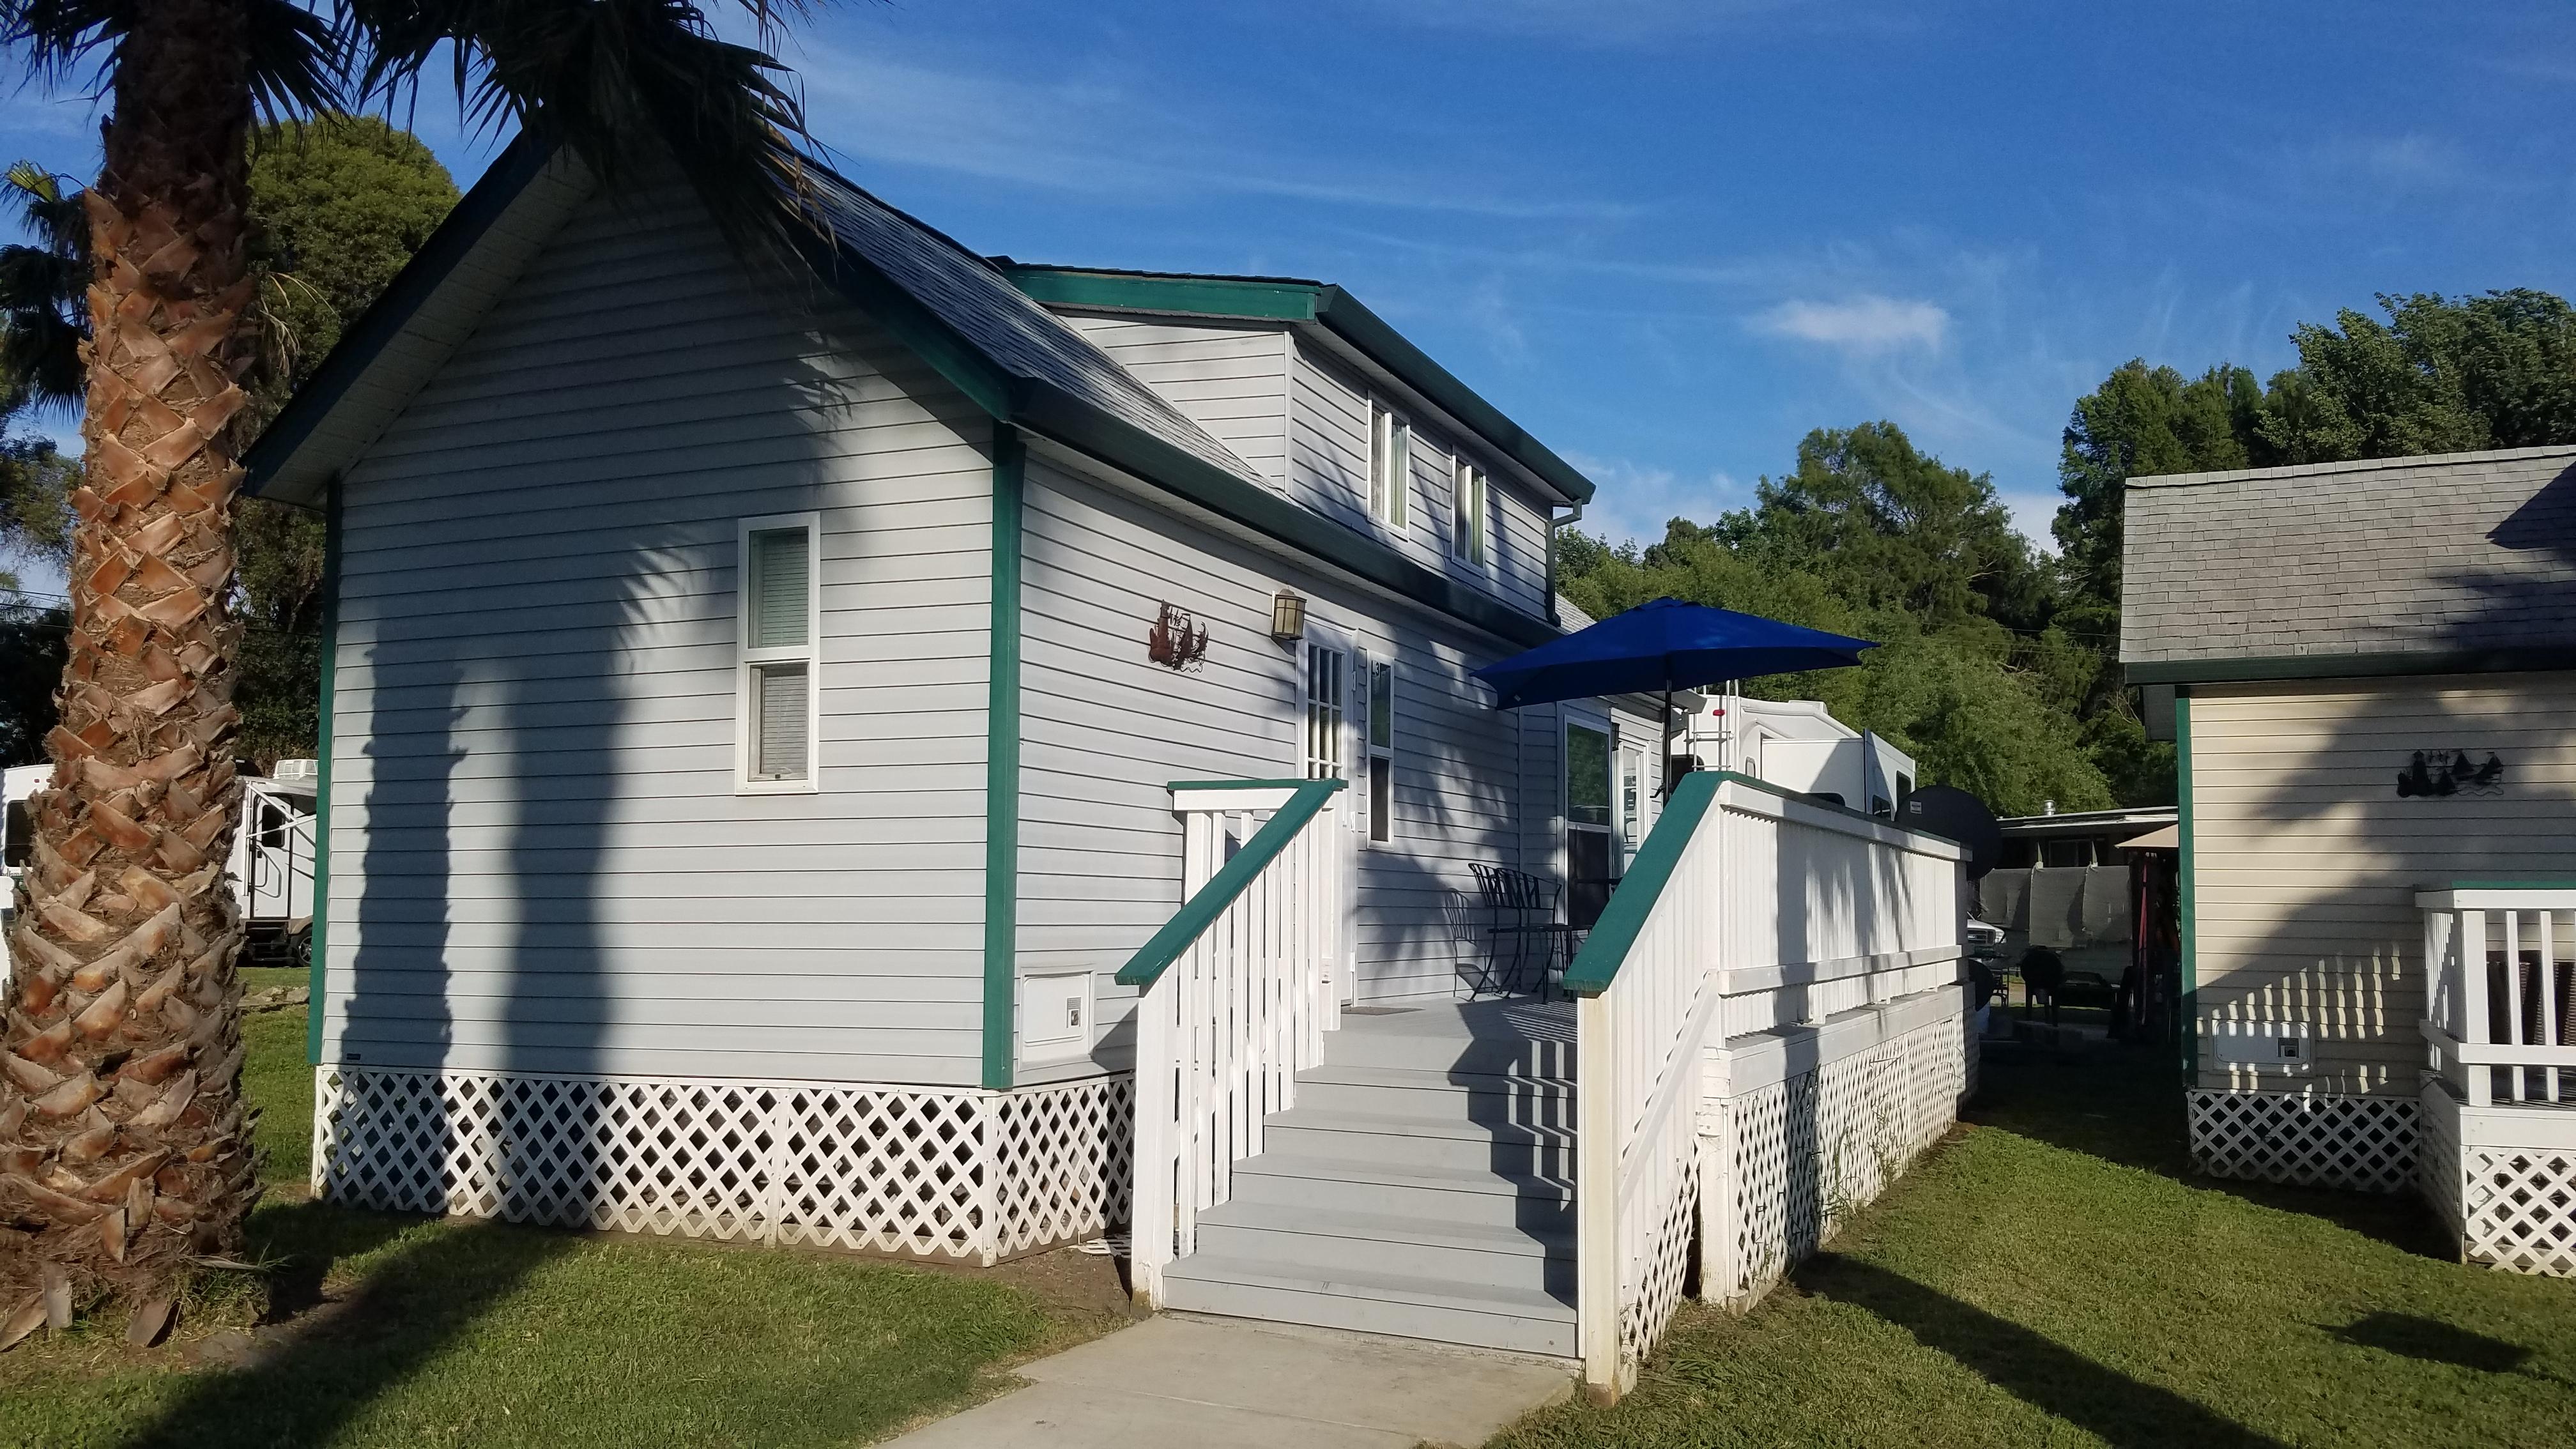 Rental Cabin at Lighthouse Resort